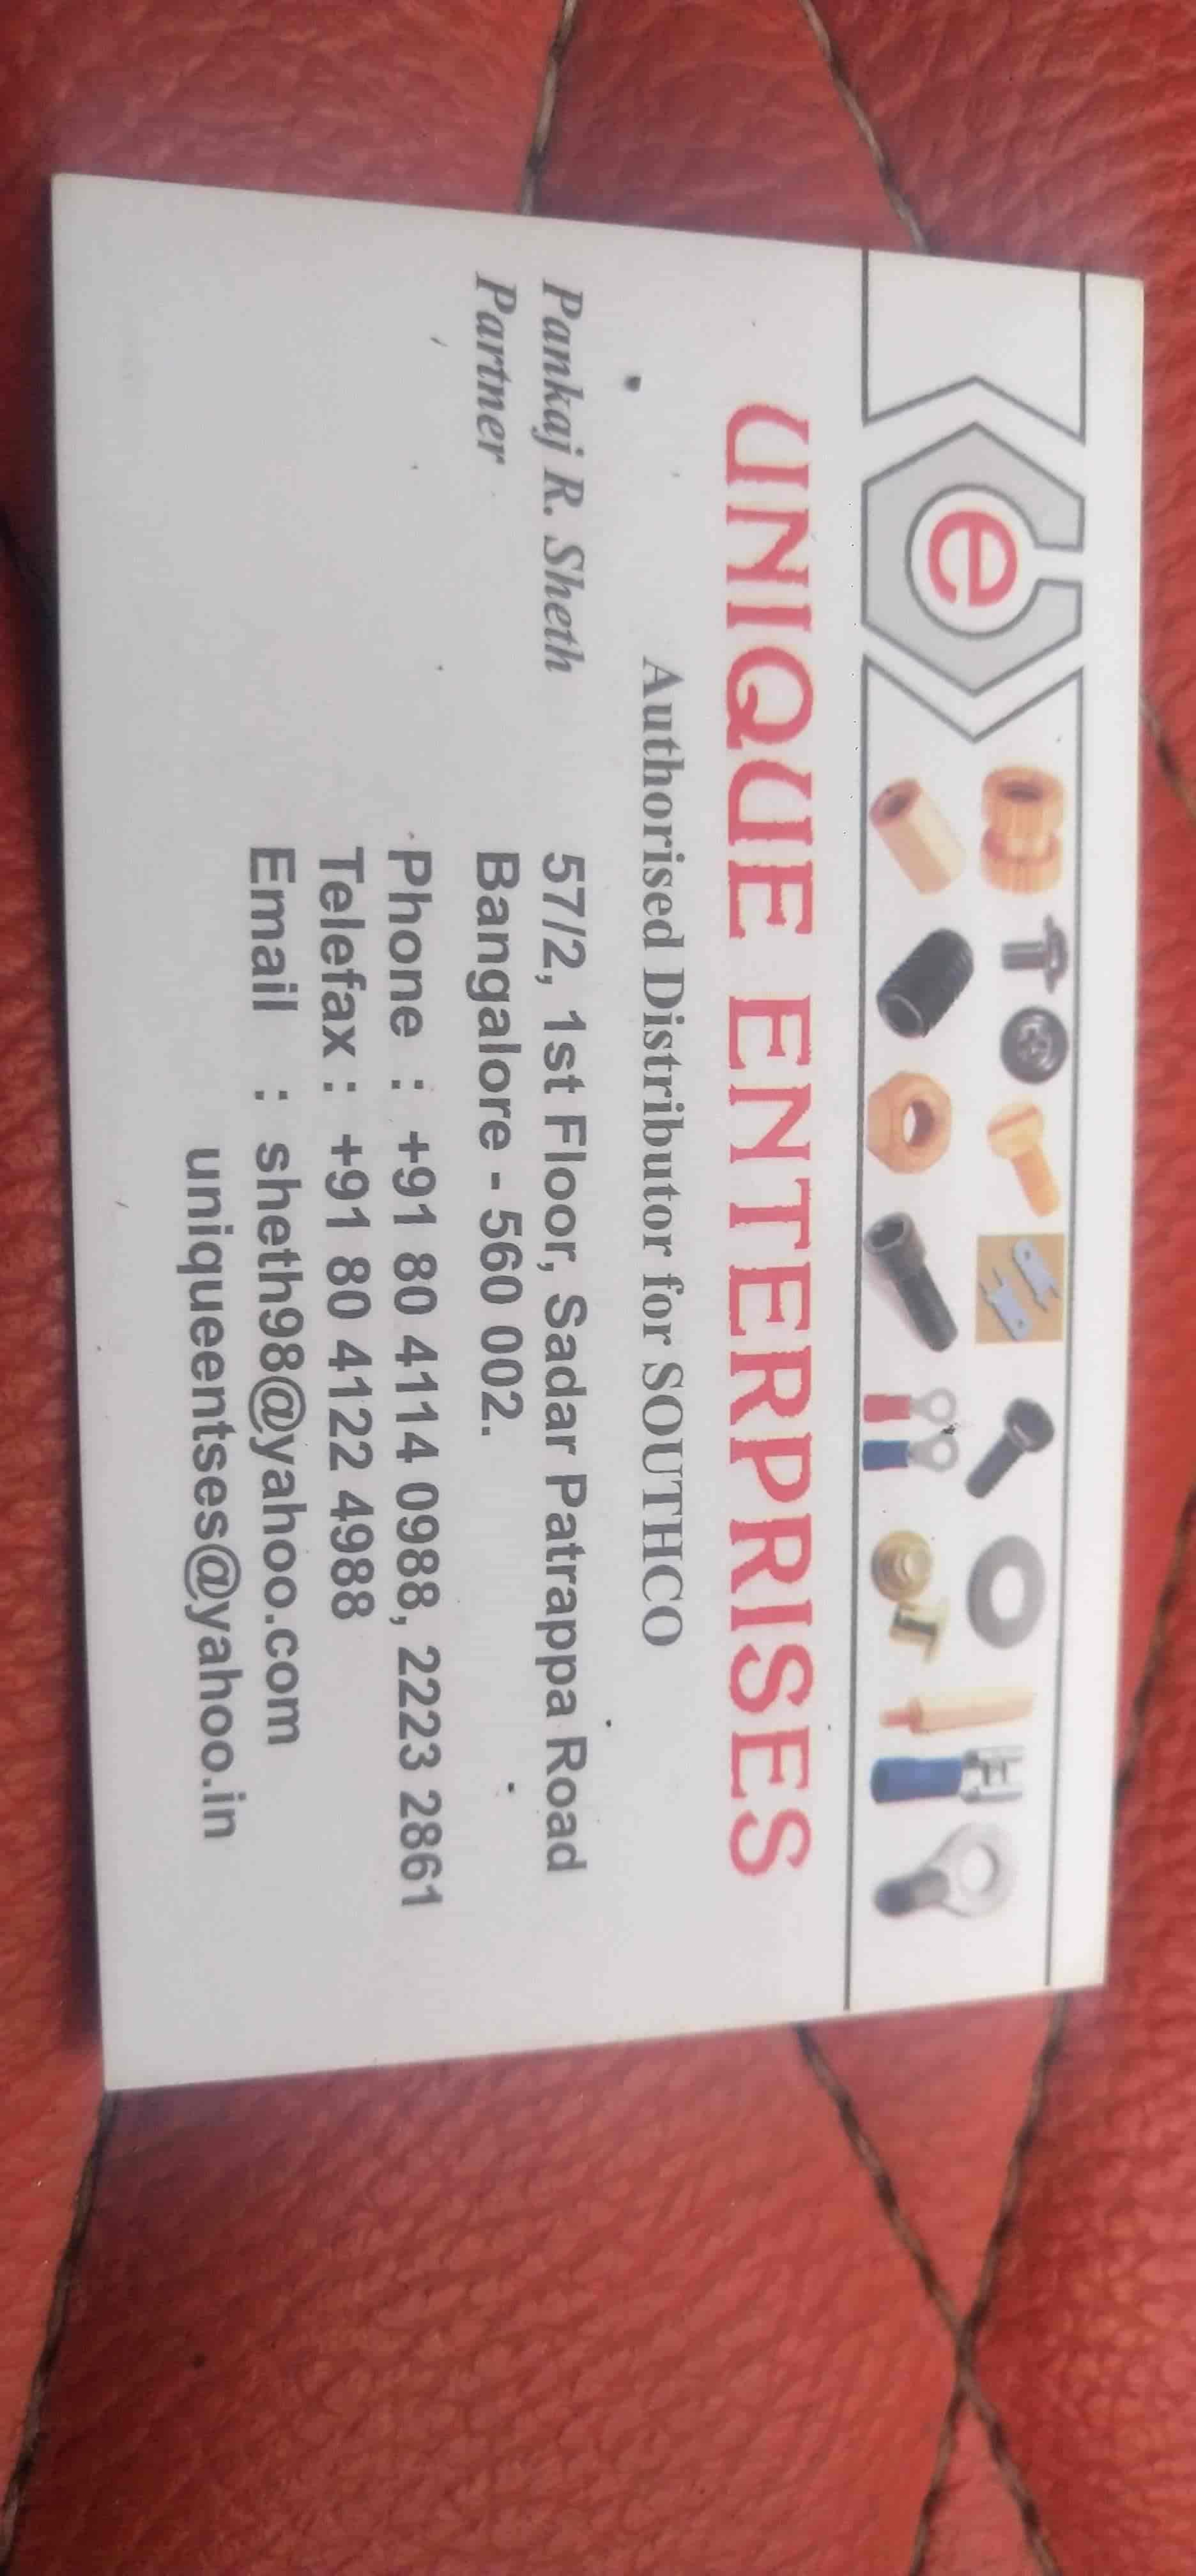 Unique Enterprises, City Market - Fastener Dealers in